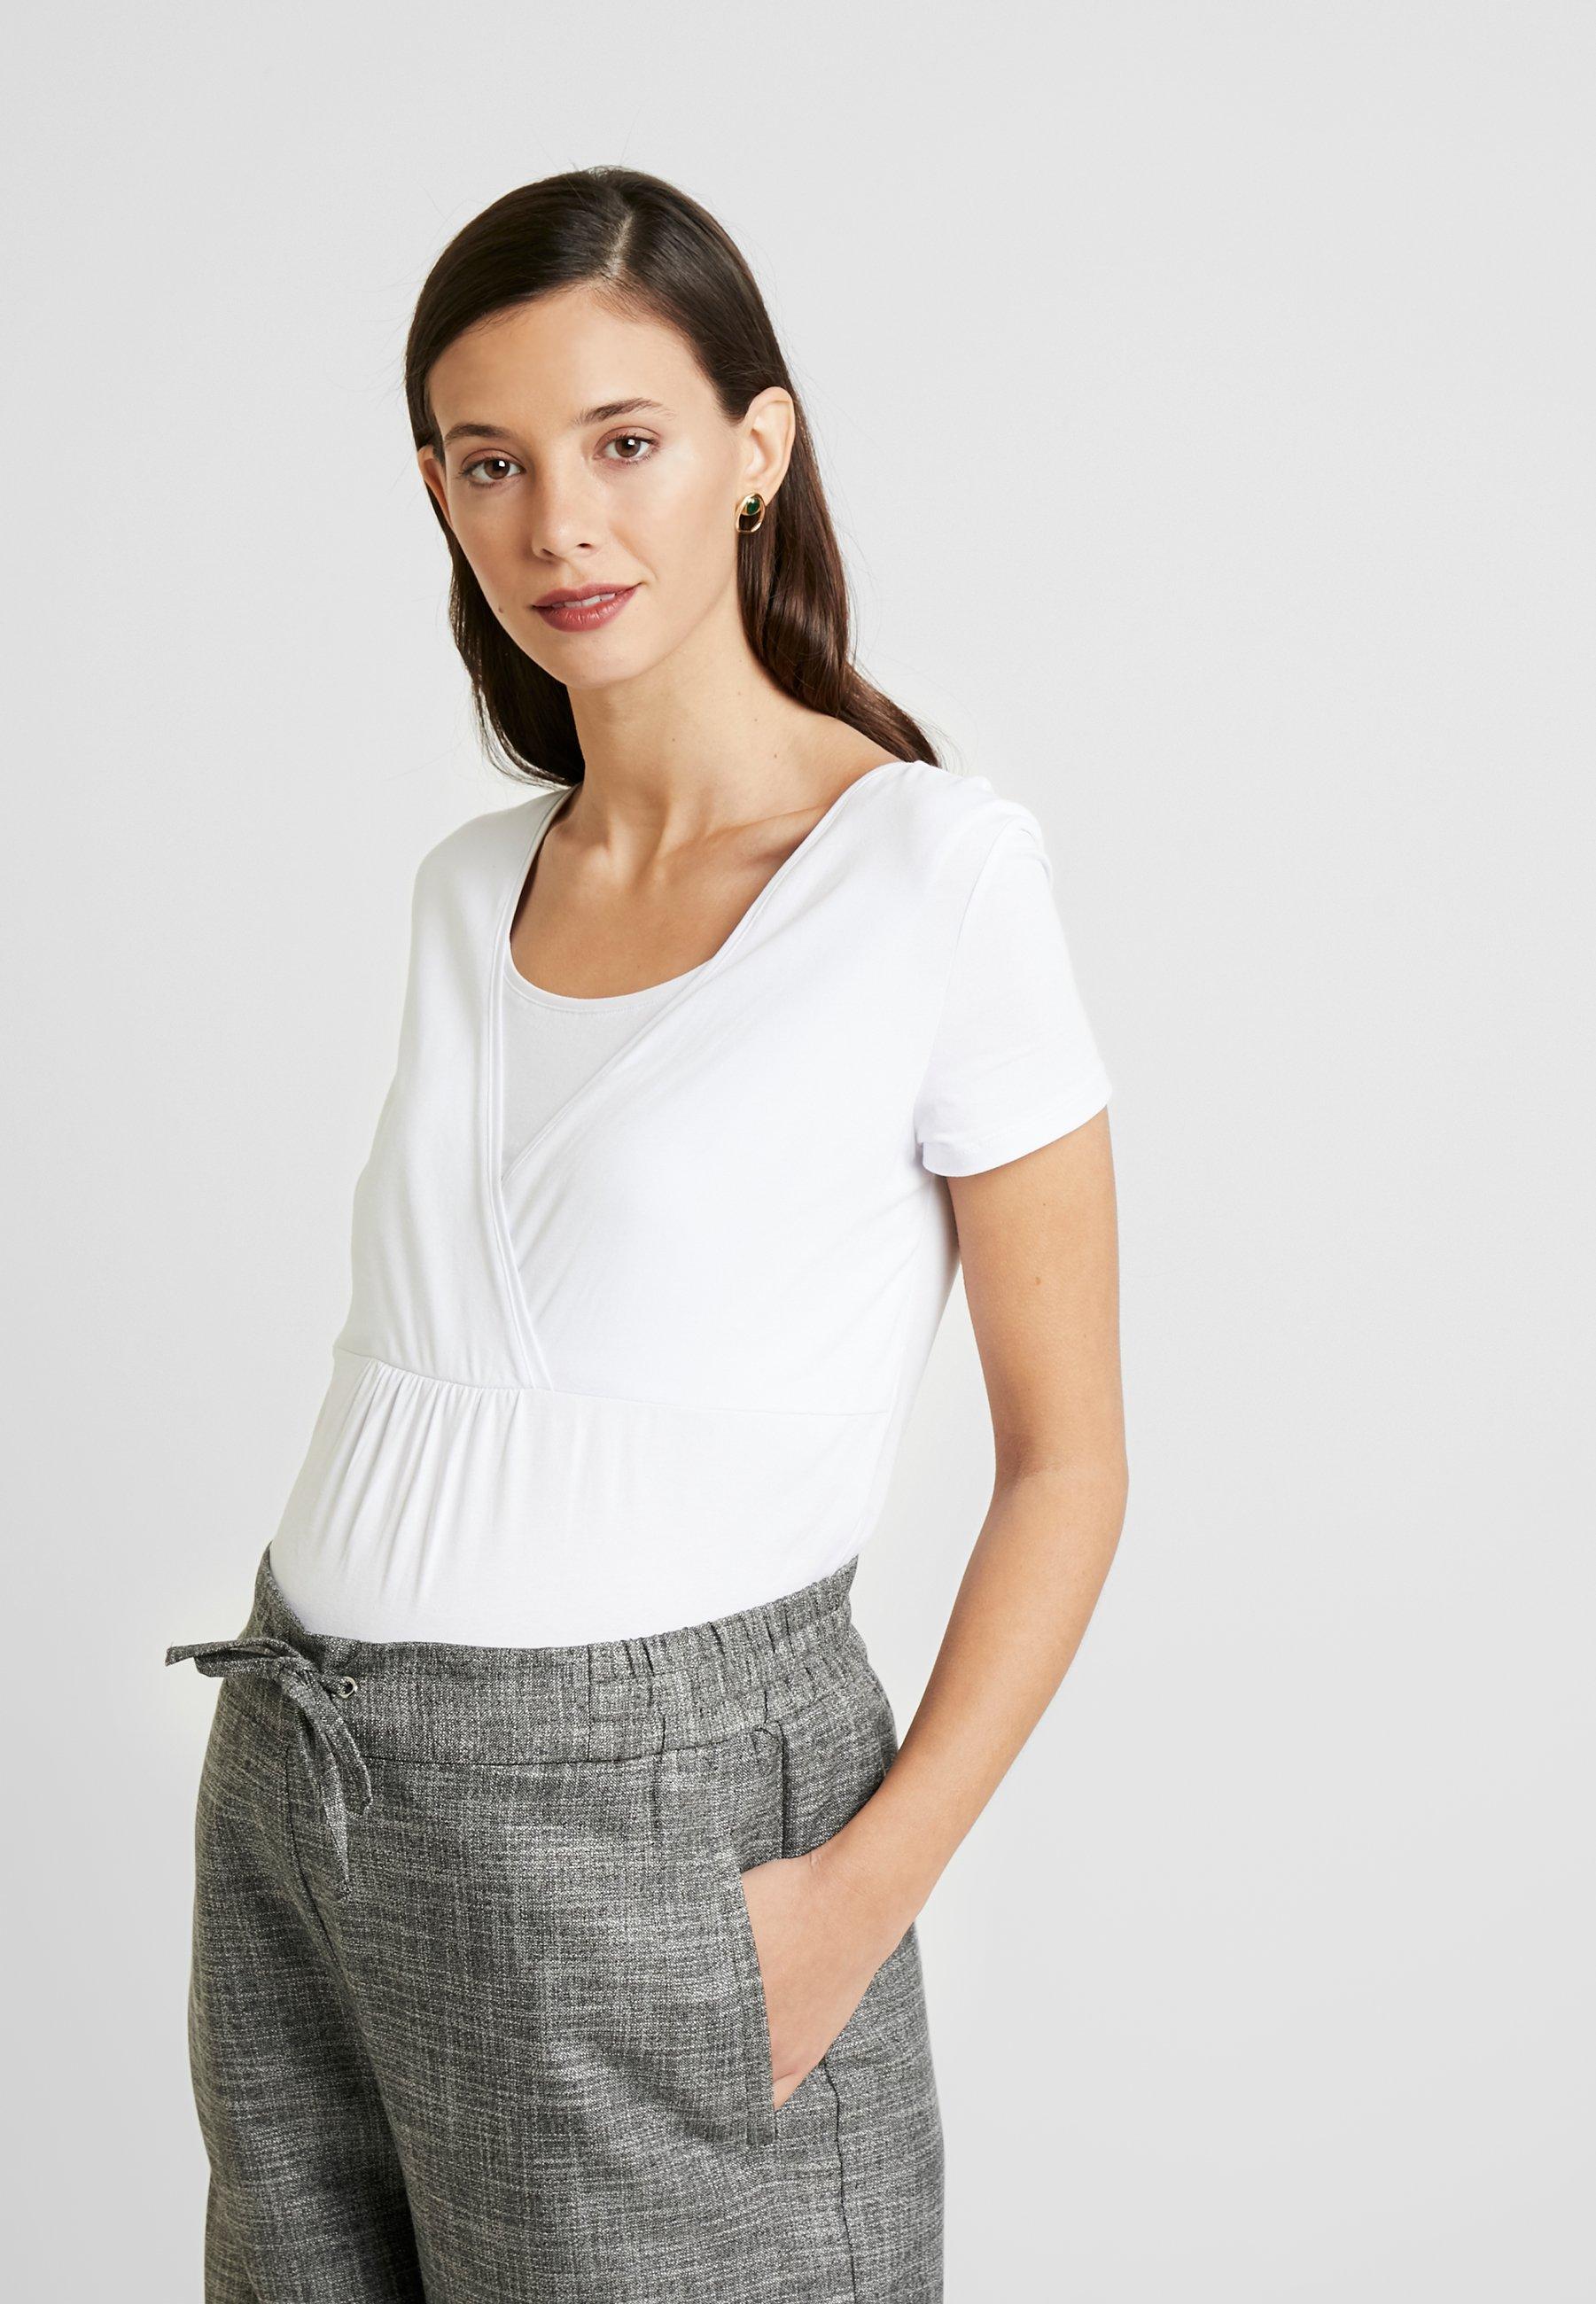 Esprit Maternity Nursing - T-shirts White